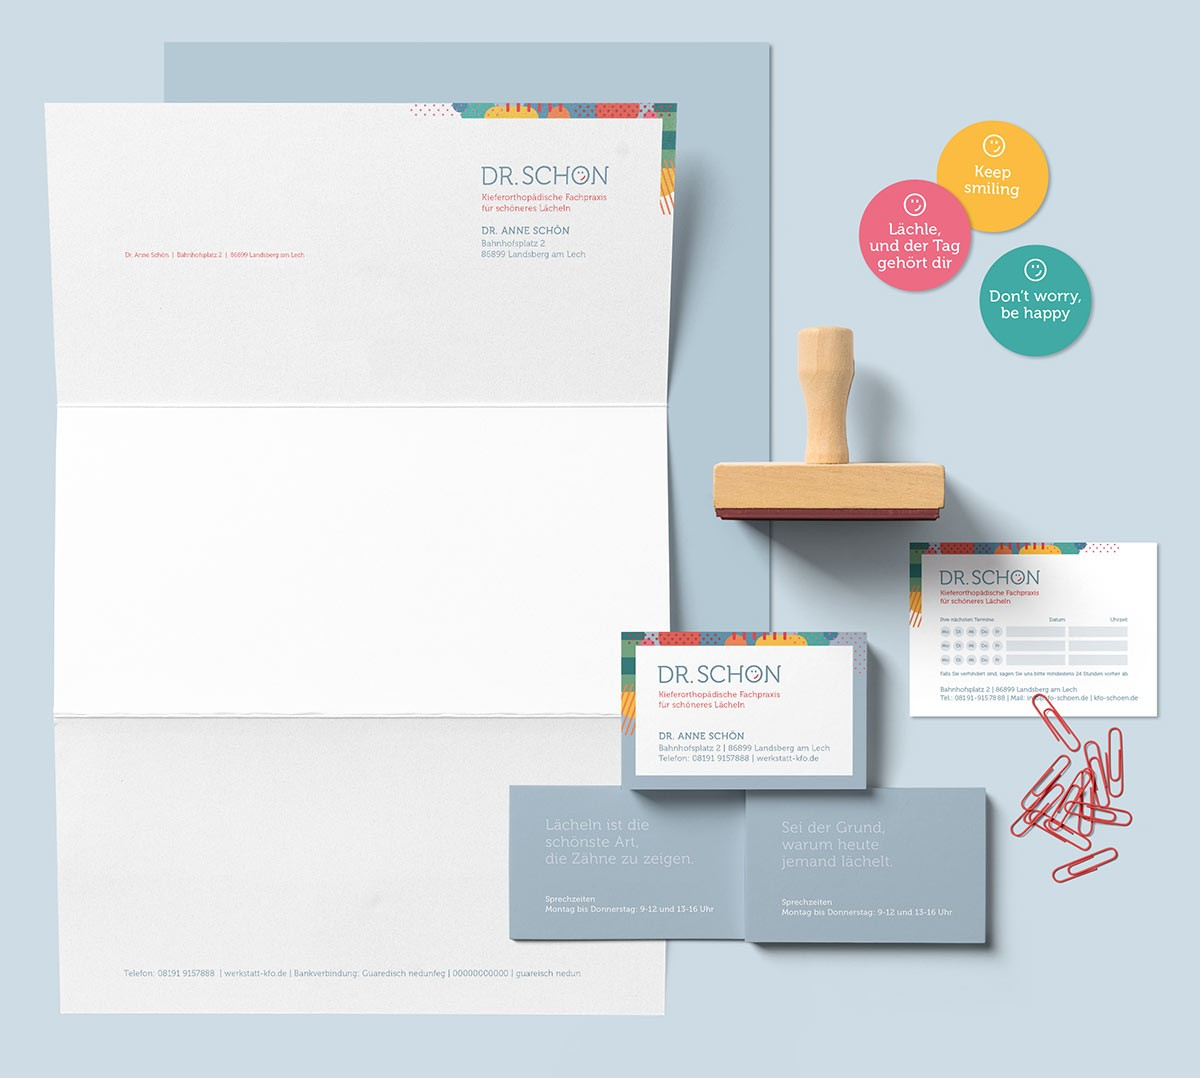 Coporate Design, Briefbogen, Visitenkarten, Aufkleber, Terminkarte - Grafik Designerin Carmen Christ